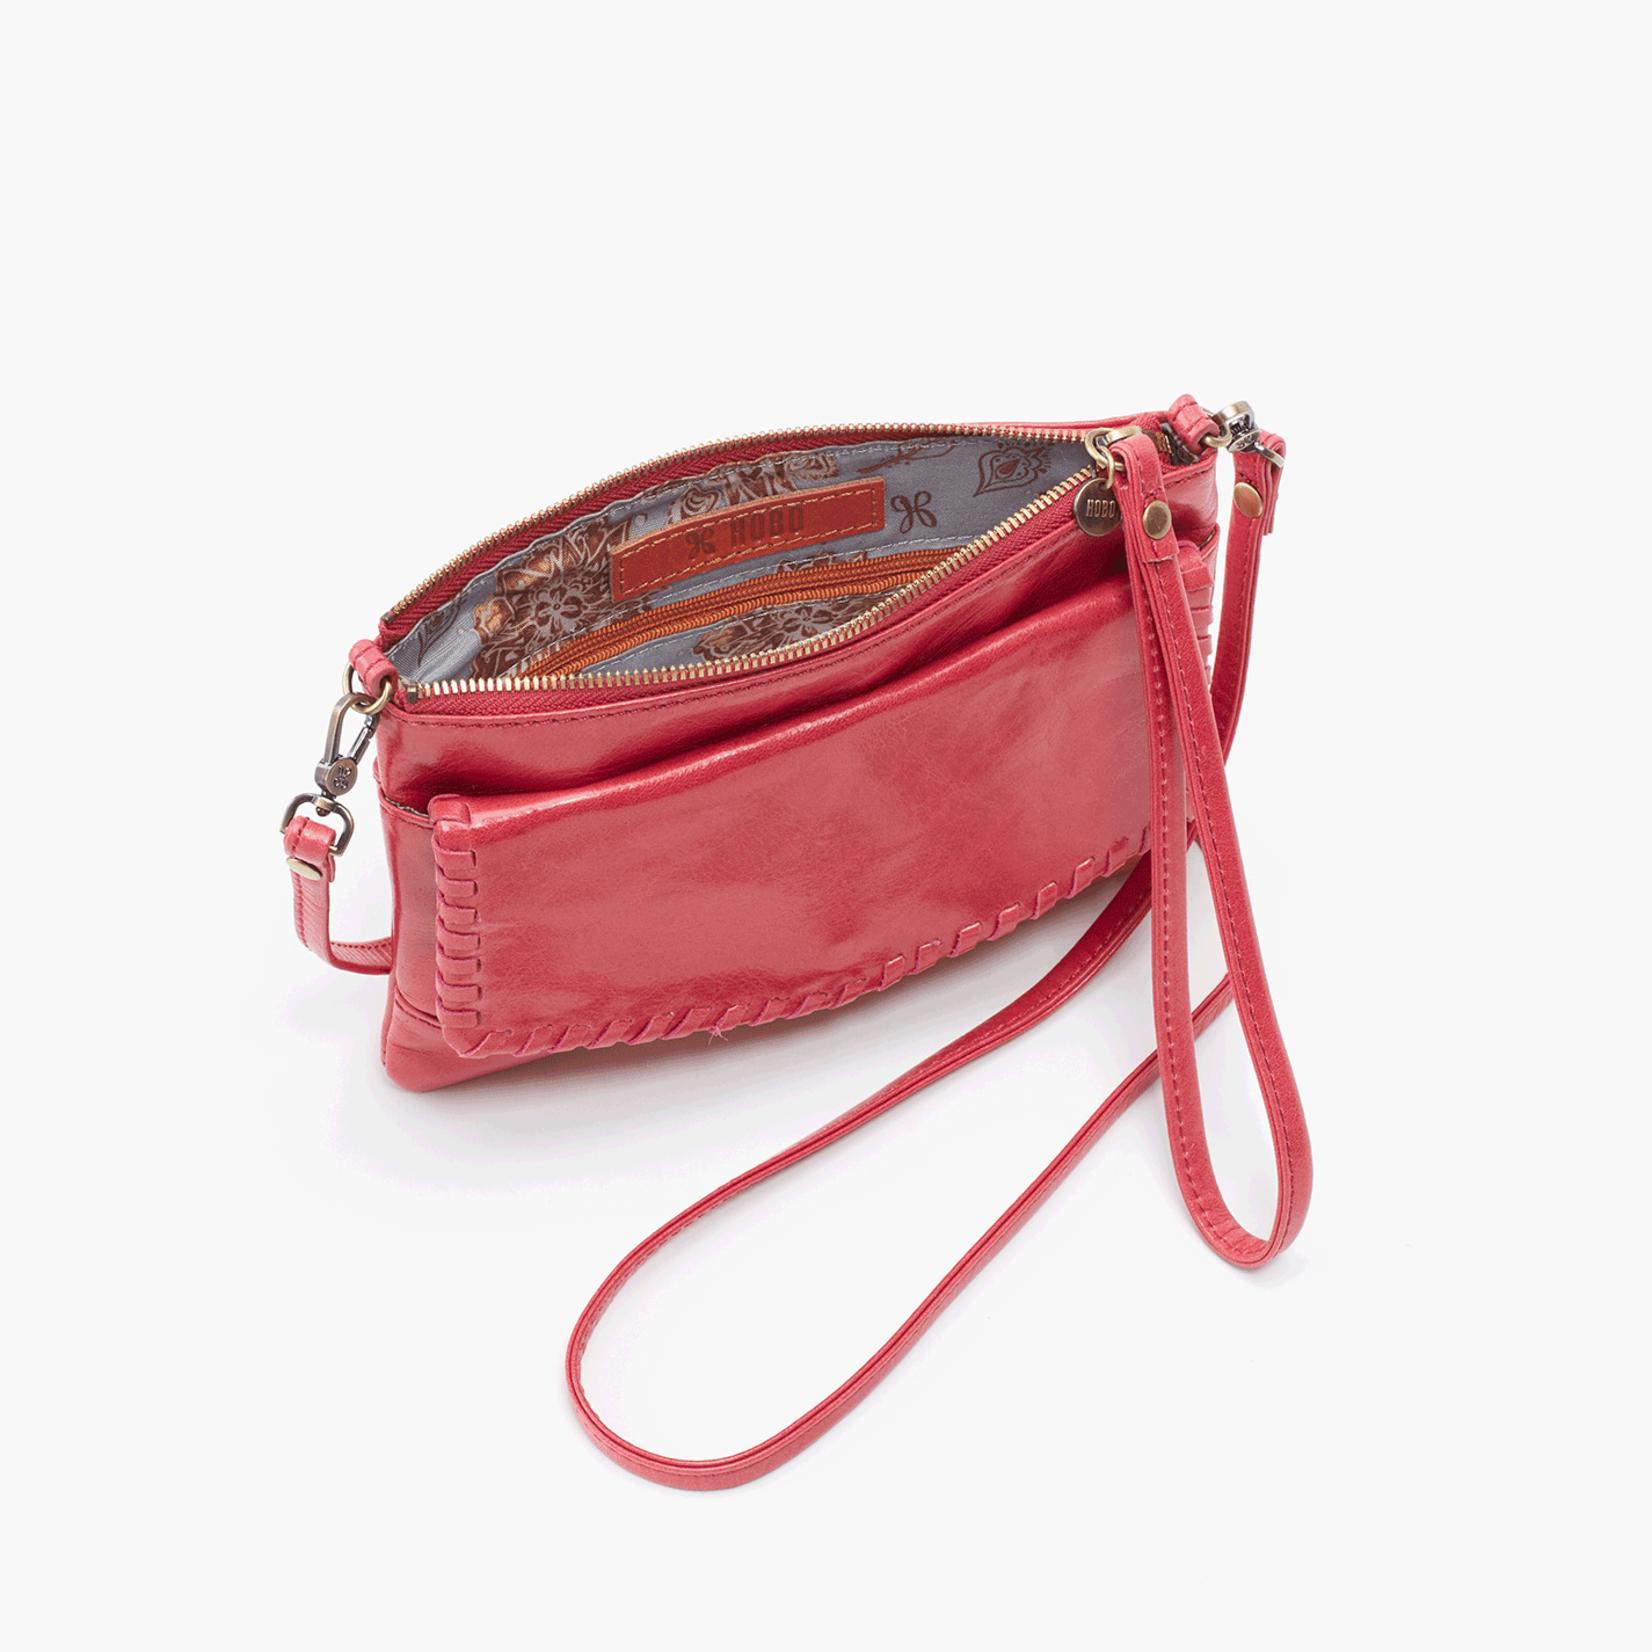 HOBO Stroll Blossom Vintage Hide Leather Crossbody/Wristlet